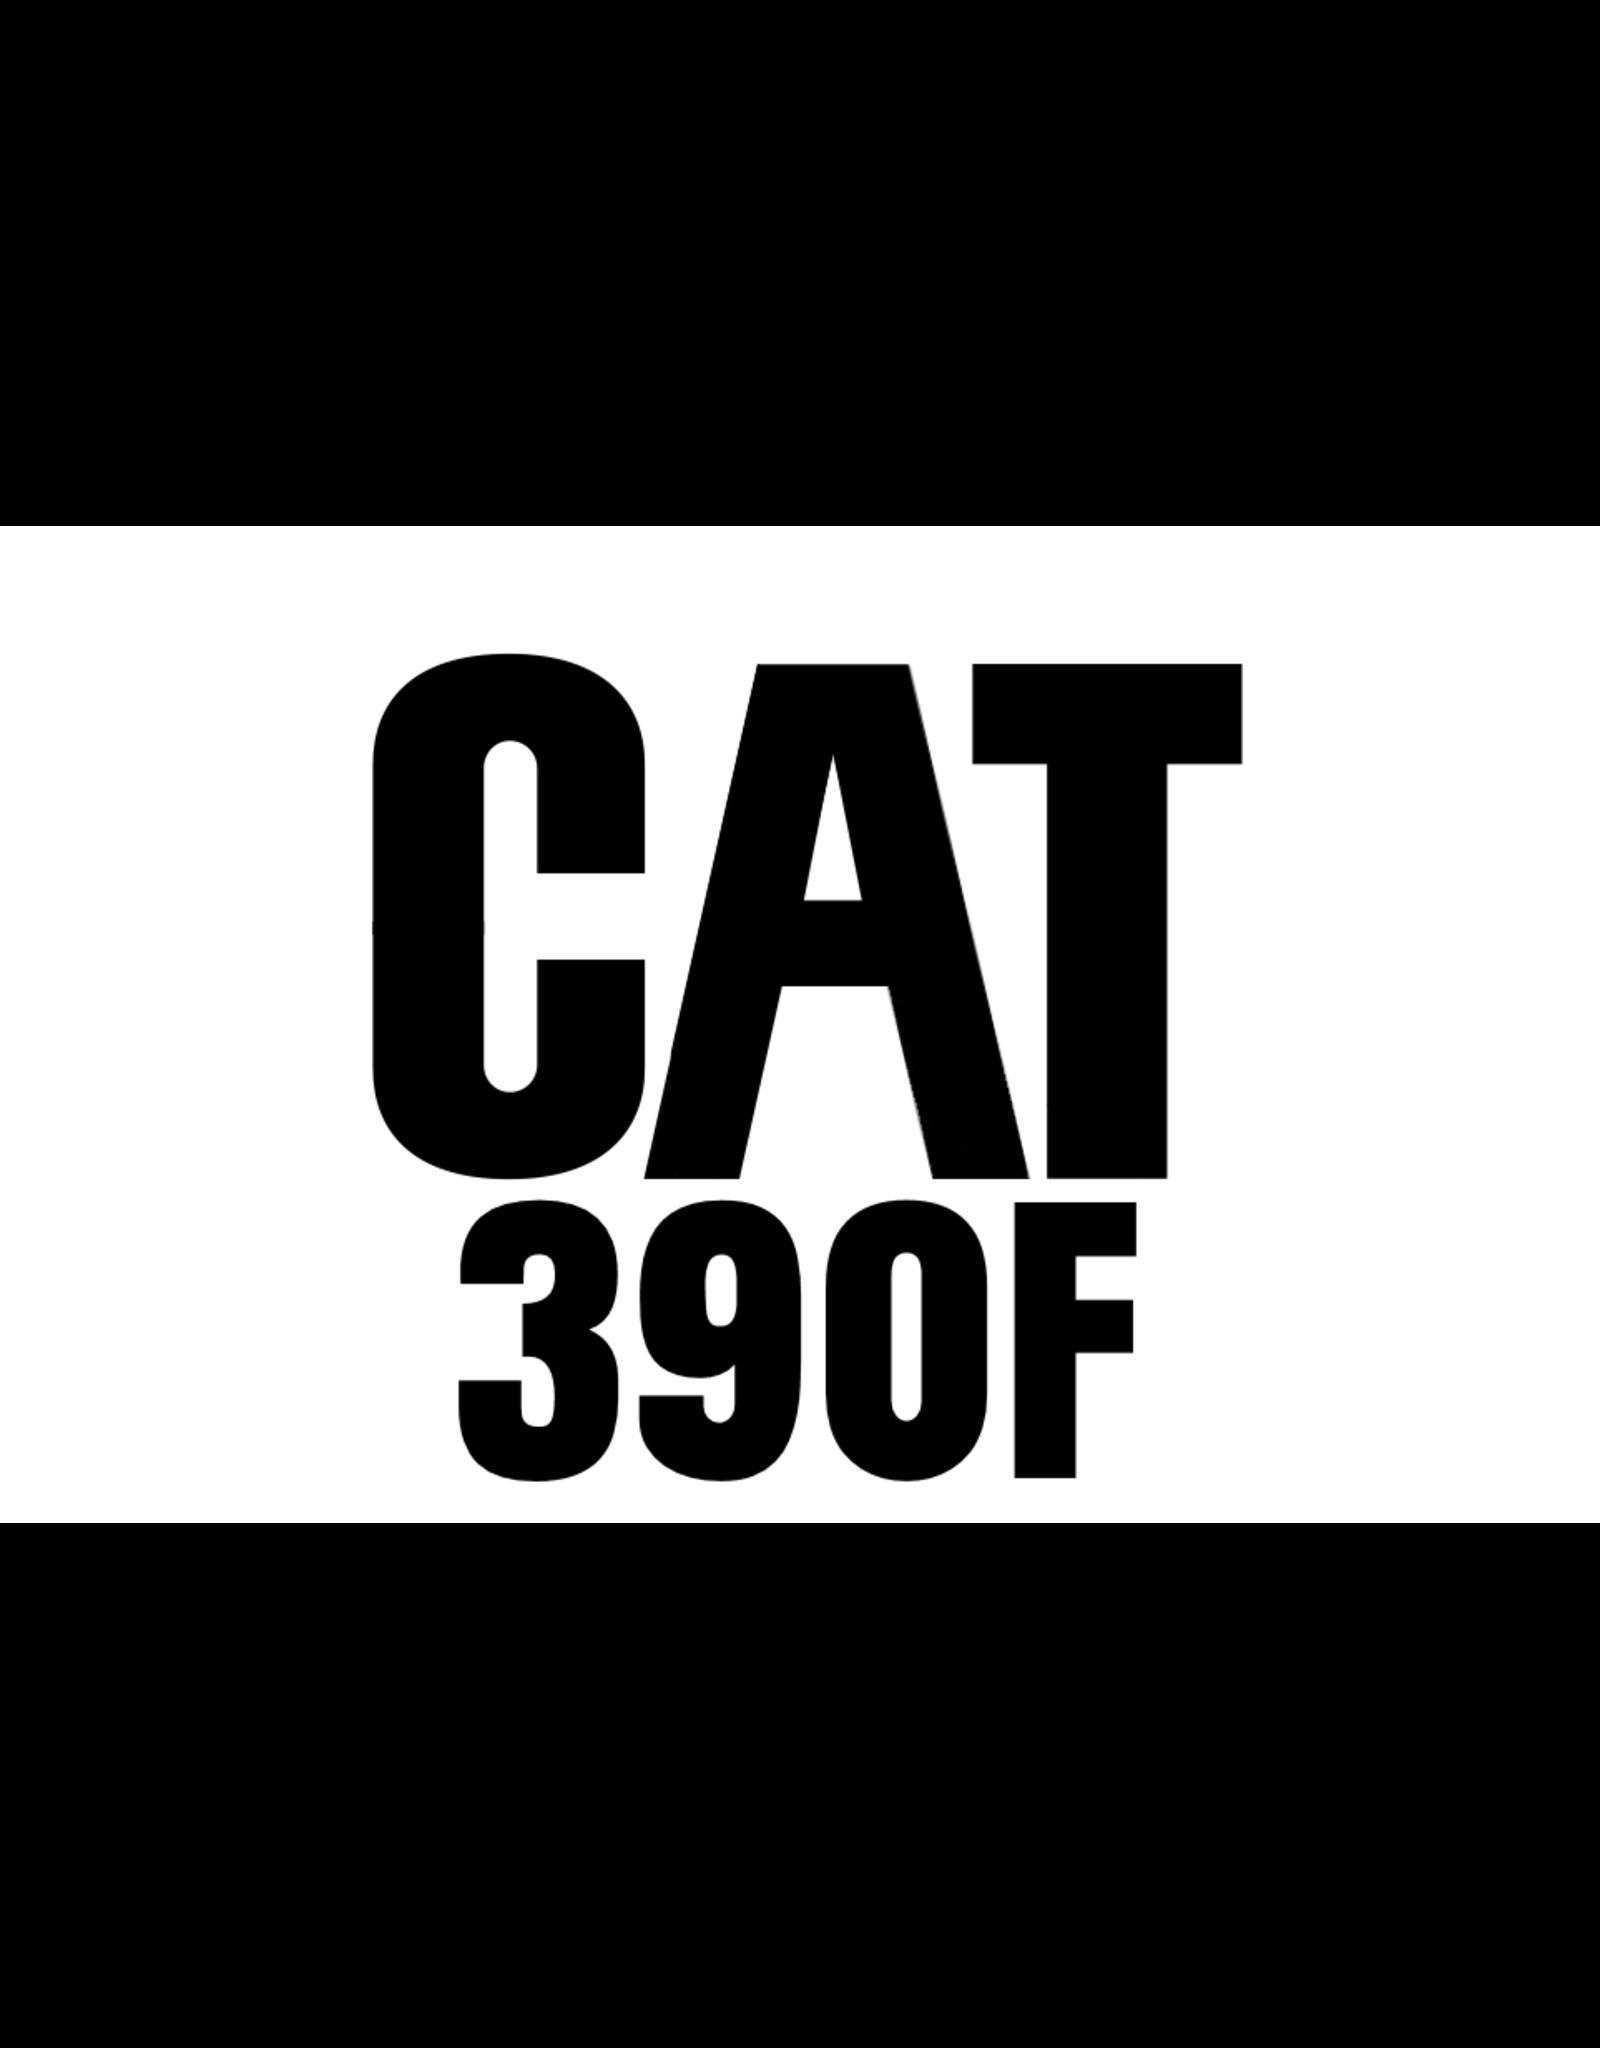 Echle Hartstahl GmbH FOPS for CAT 390F